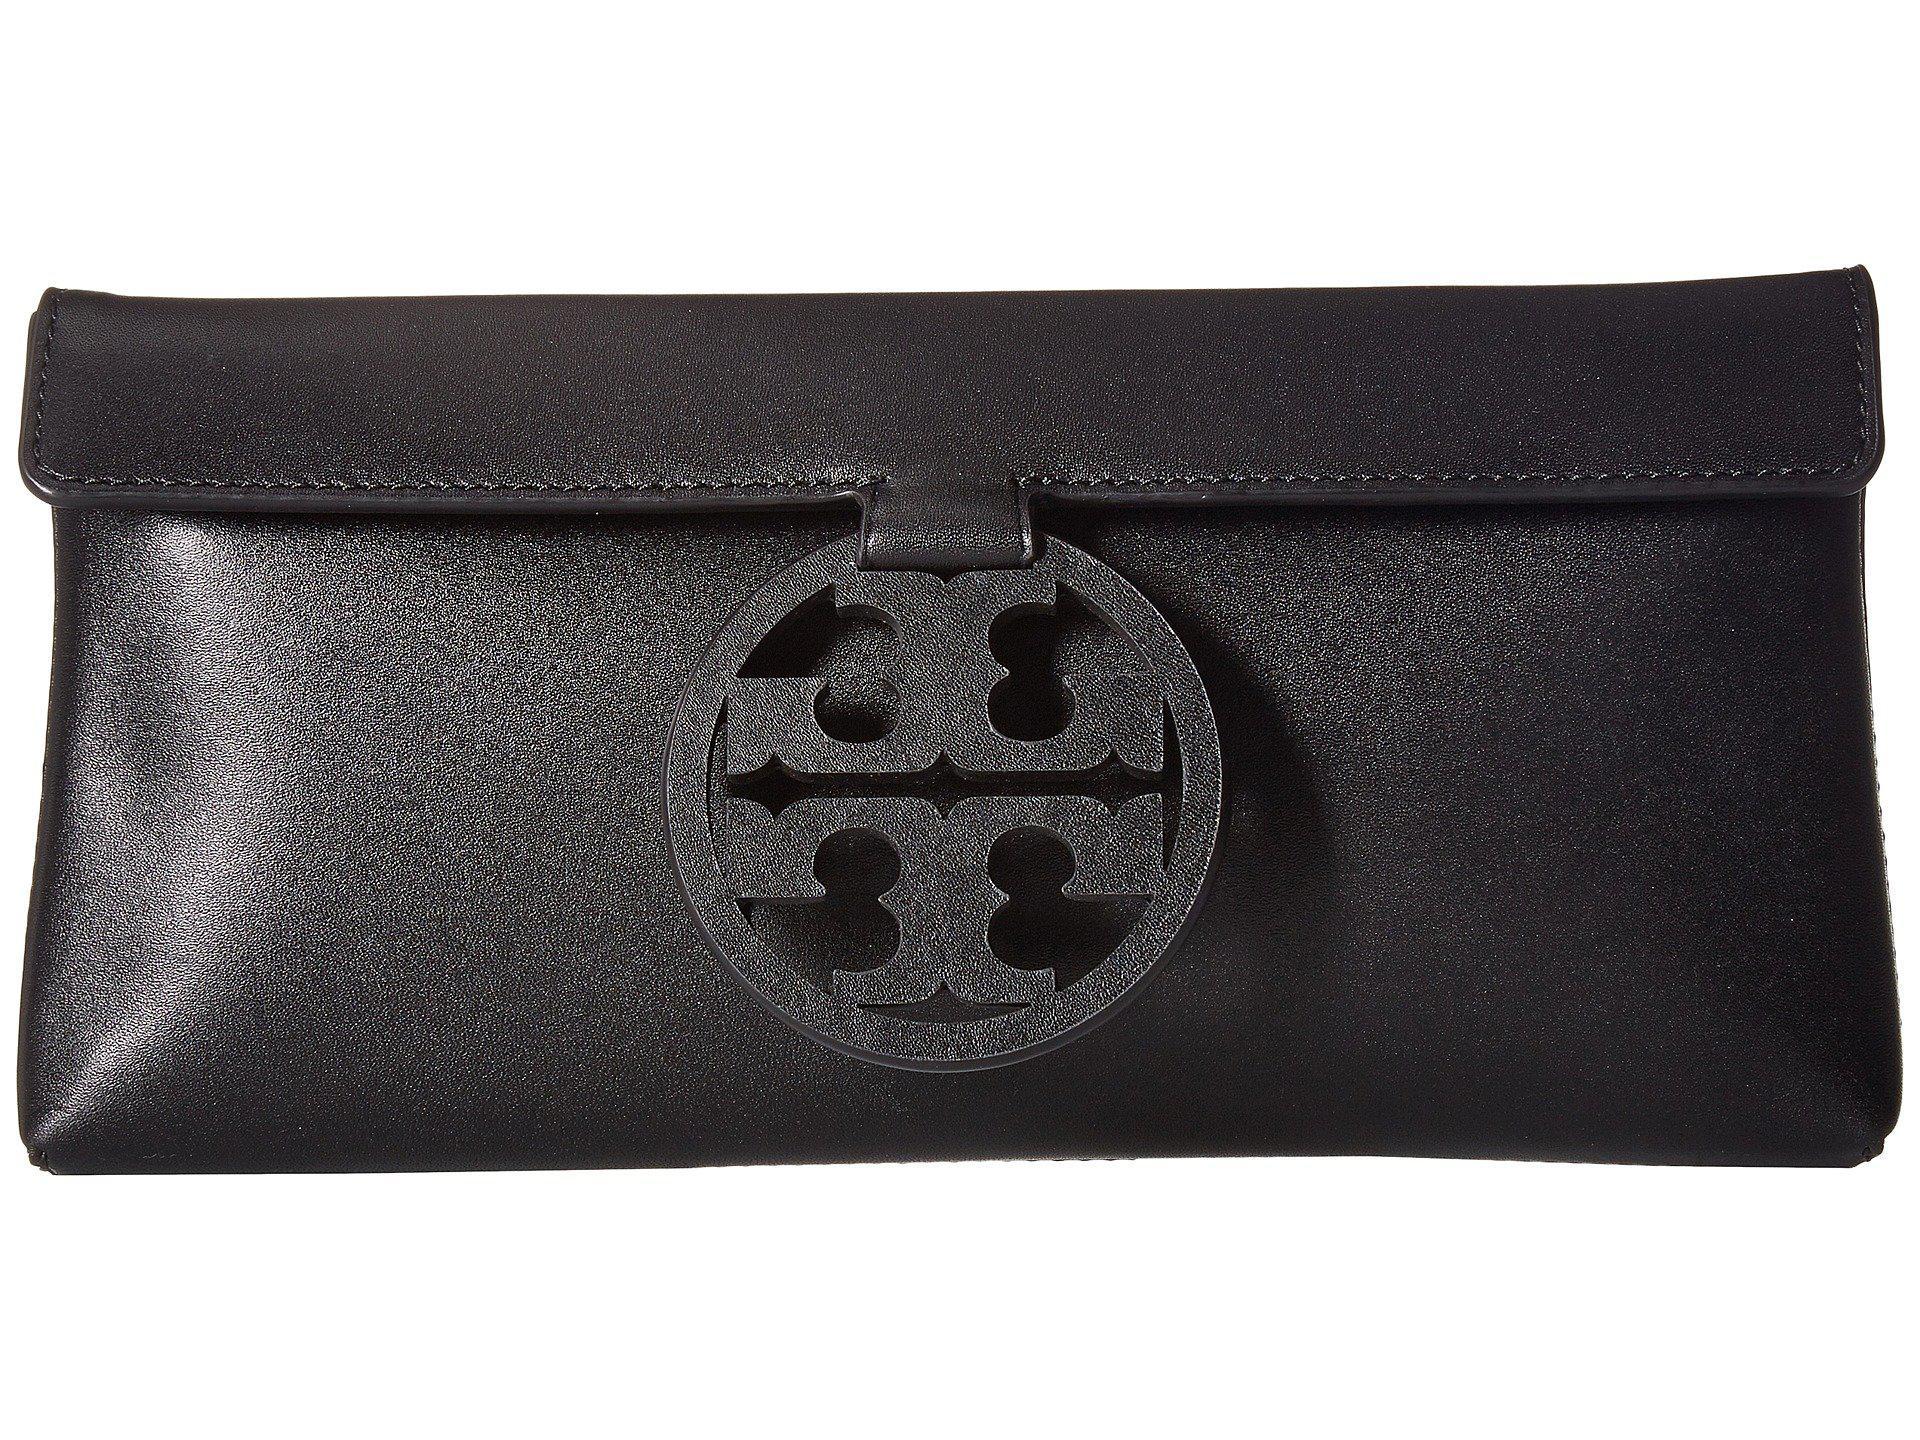 d101bbad4523 Lyst - Tory Burch Miller Clutch (black) Clutch Handbags in Black